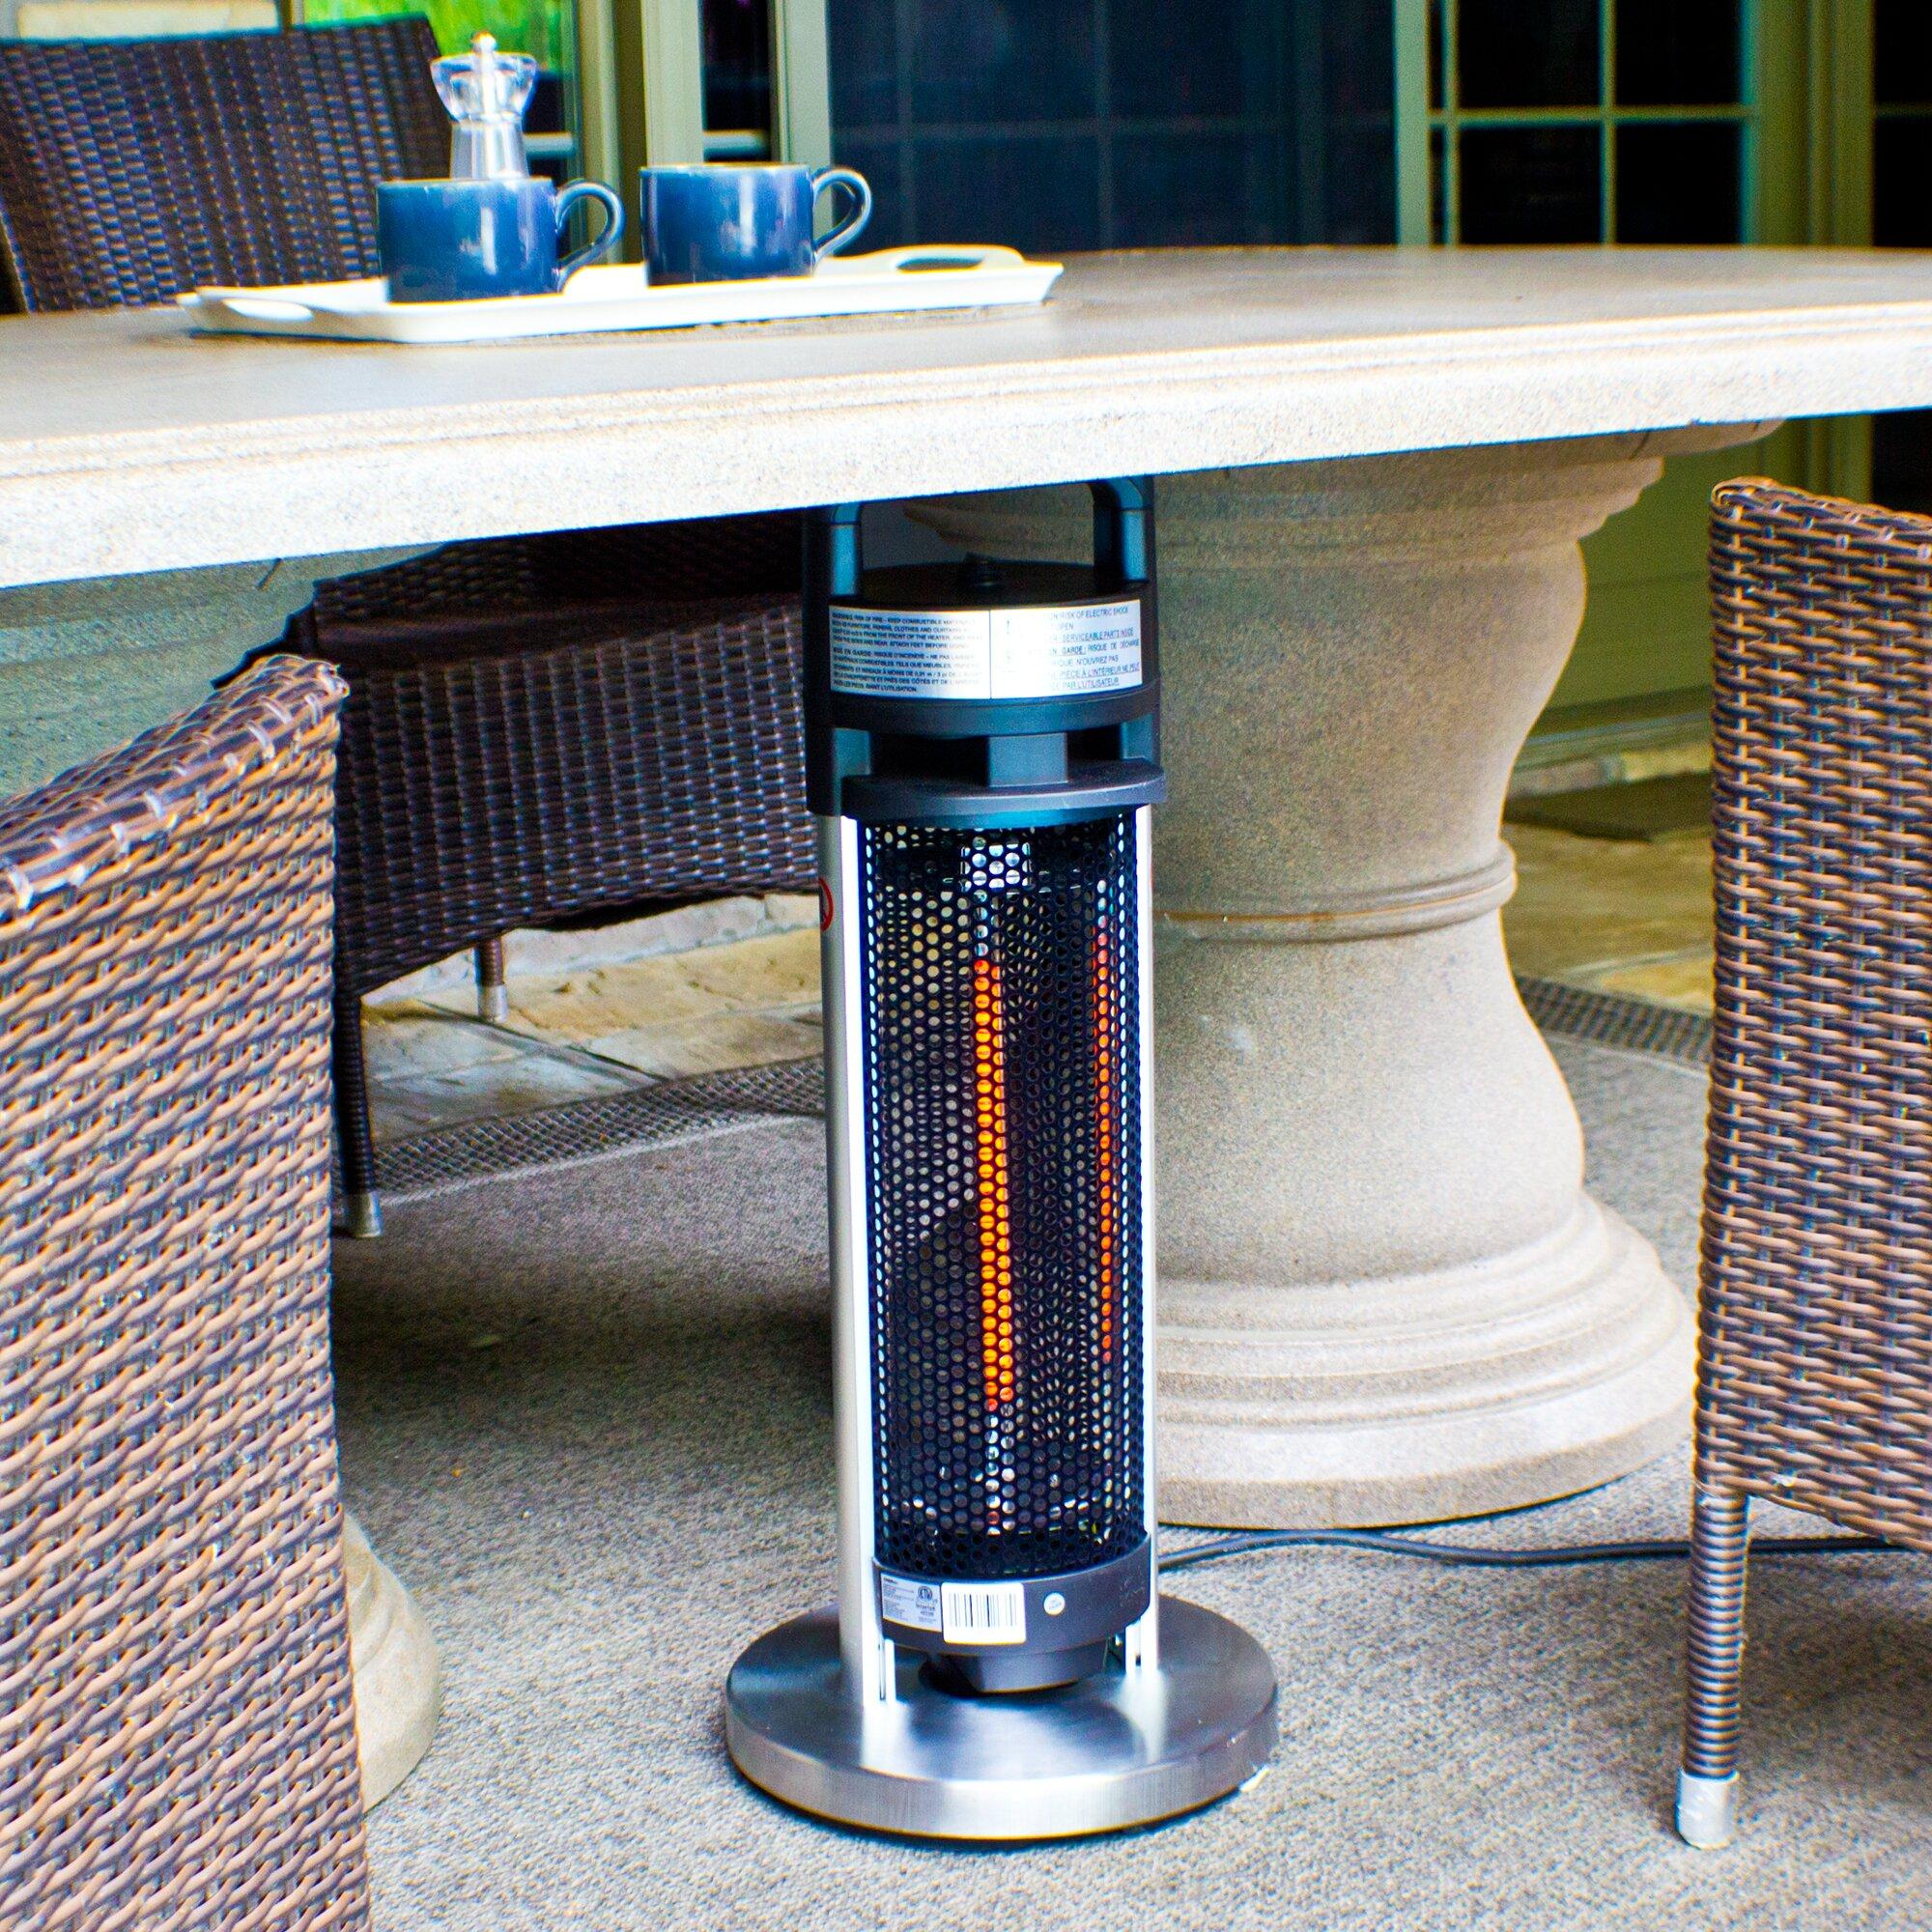 EnerG+ 4 Seasons Infrared 900 Watt Electric Tabletop Patio ...